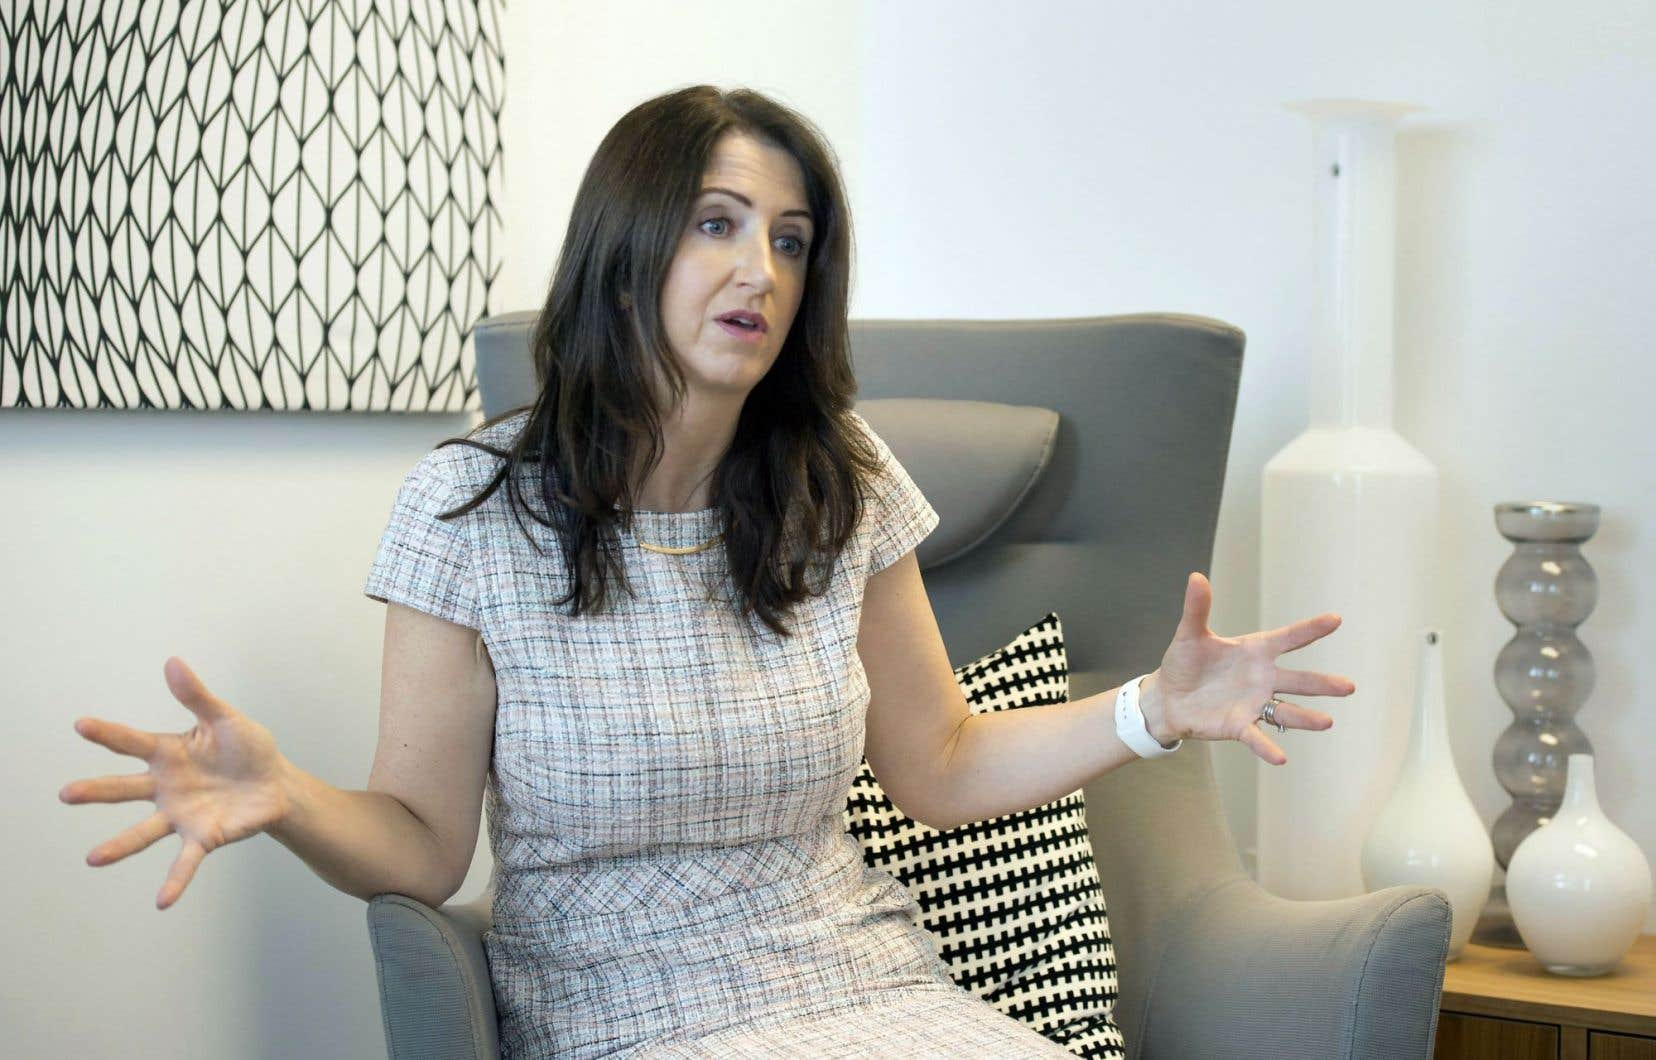 La nouvelle présidente d'IKEA Canada, Marsha Smith